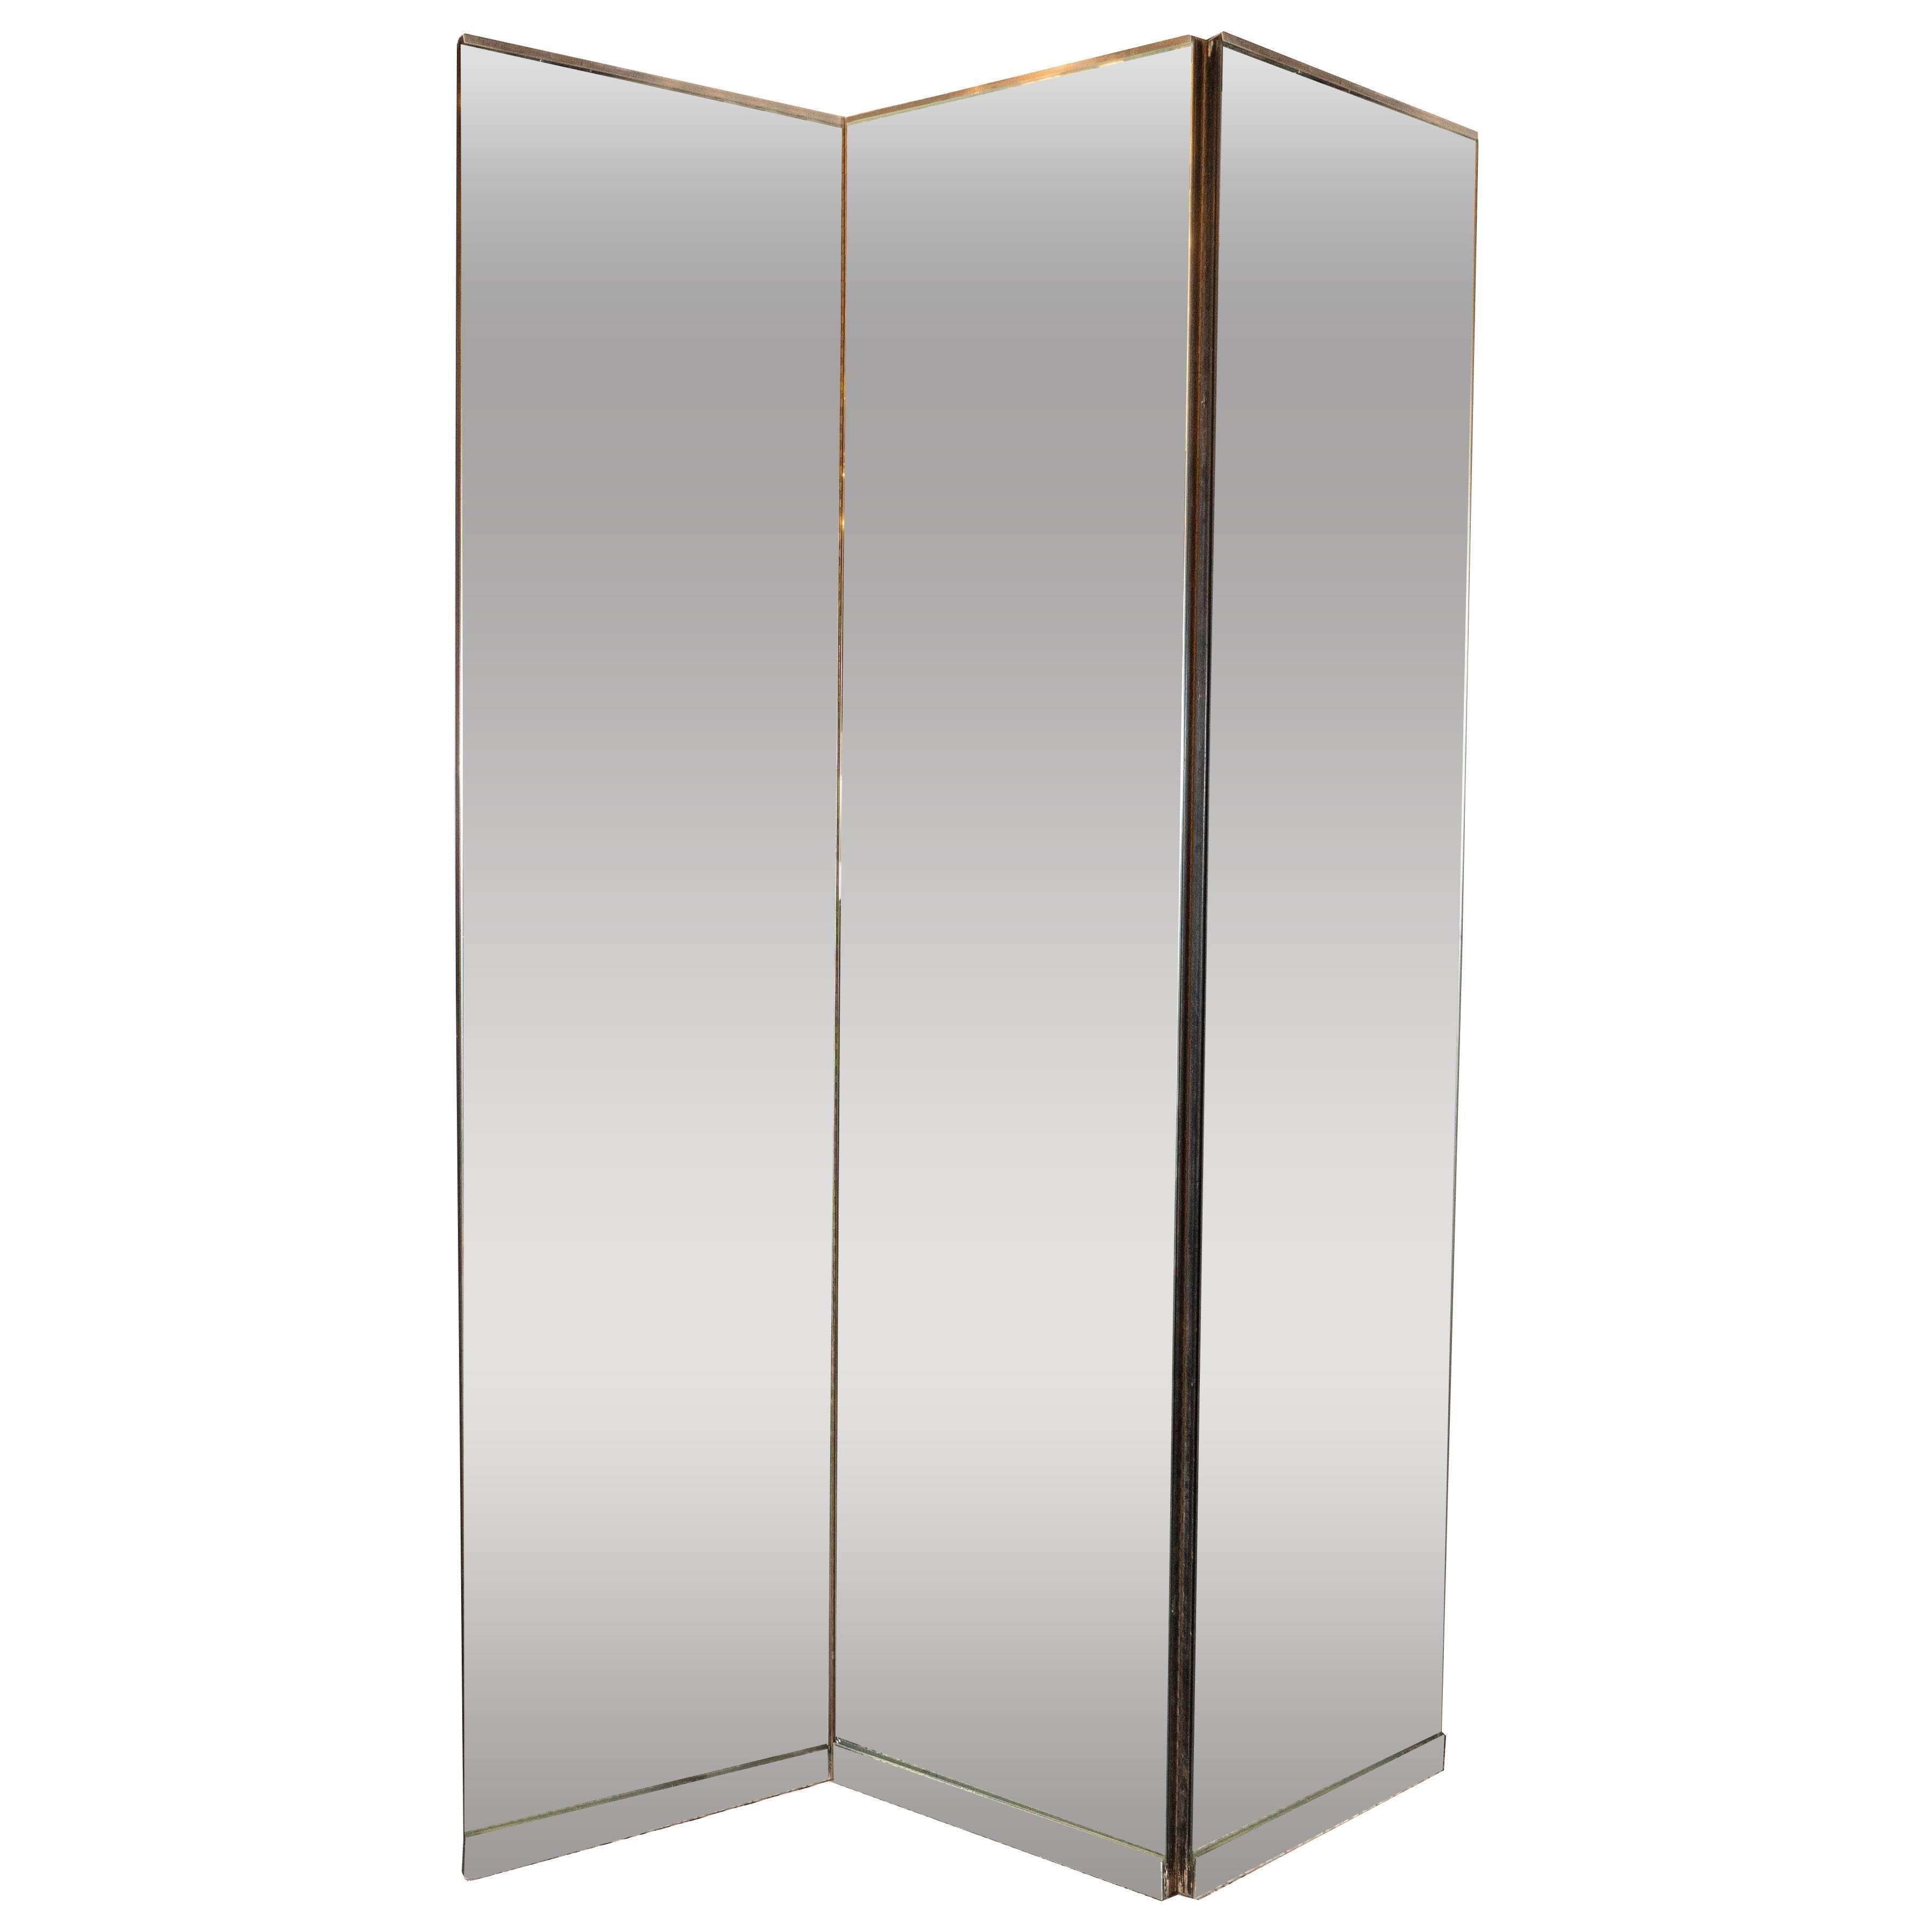 American Mid-Century Modern Monumental Three-Panel Mirrored Screen